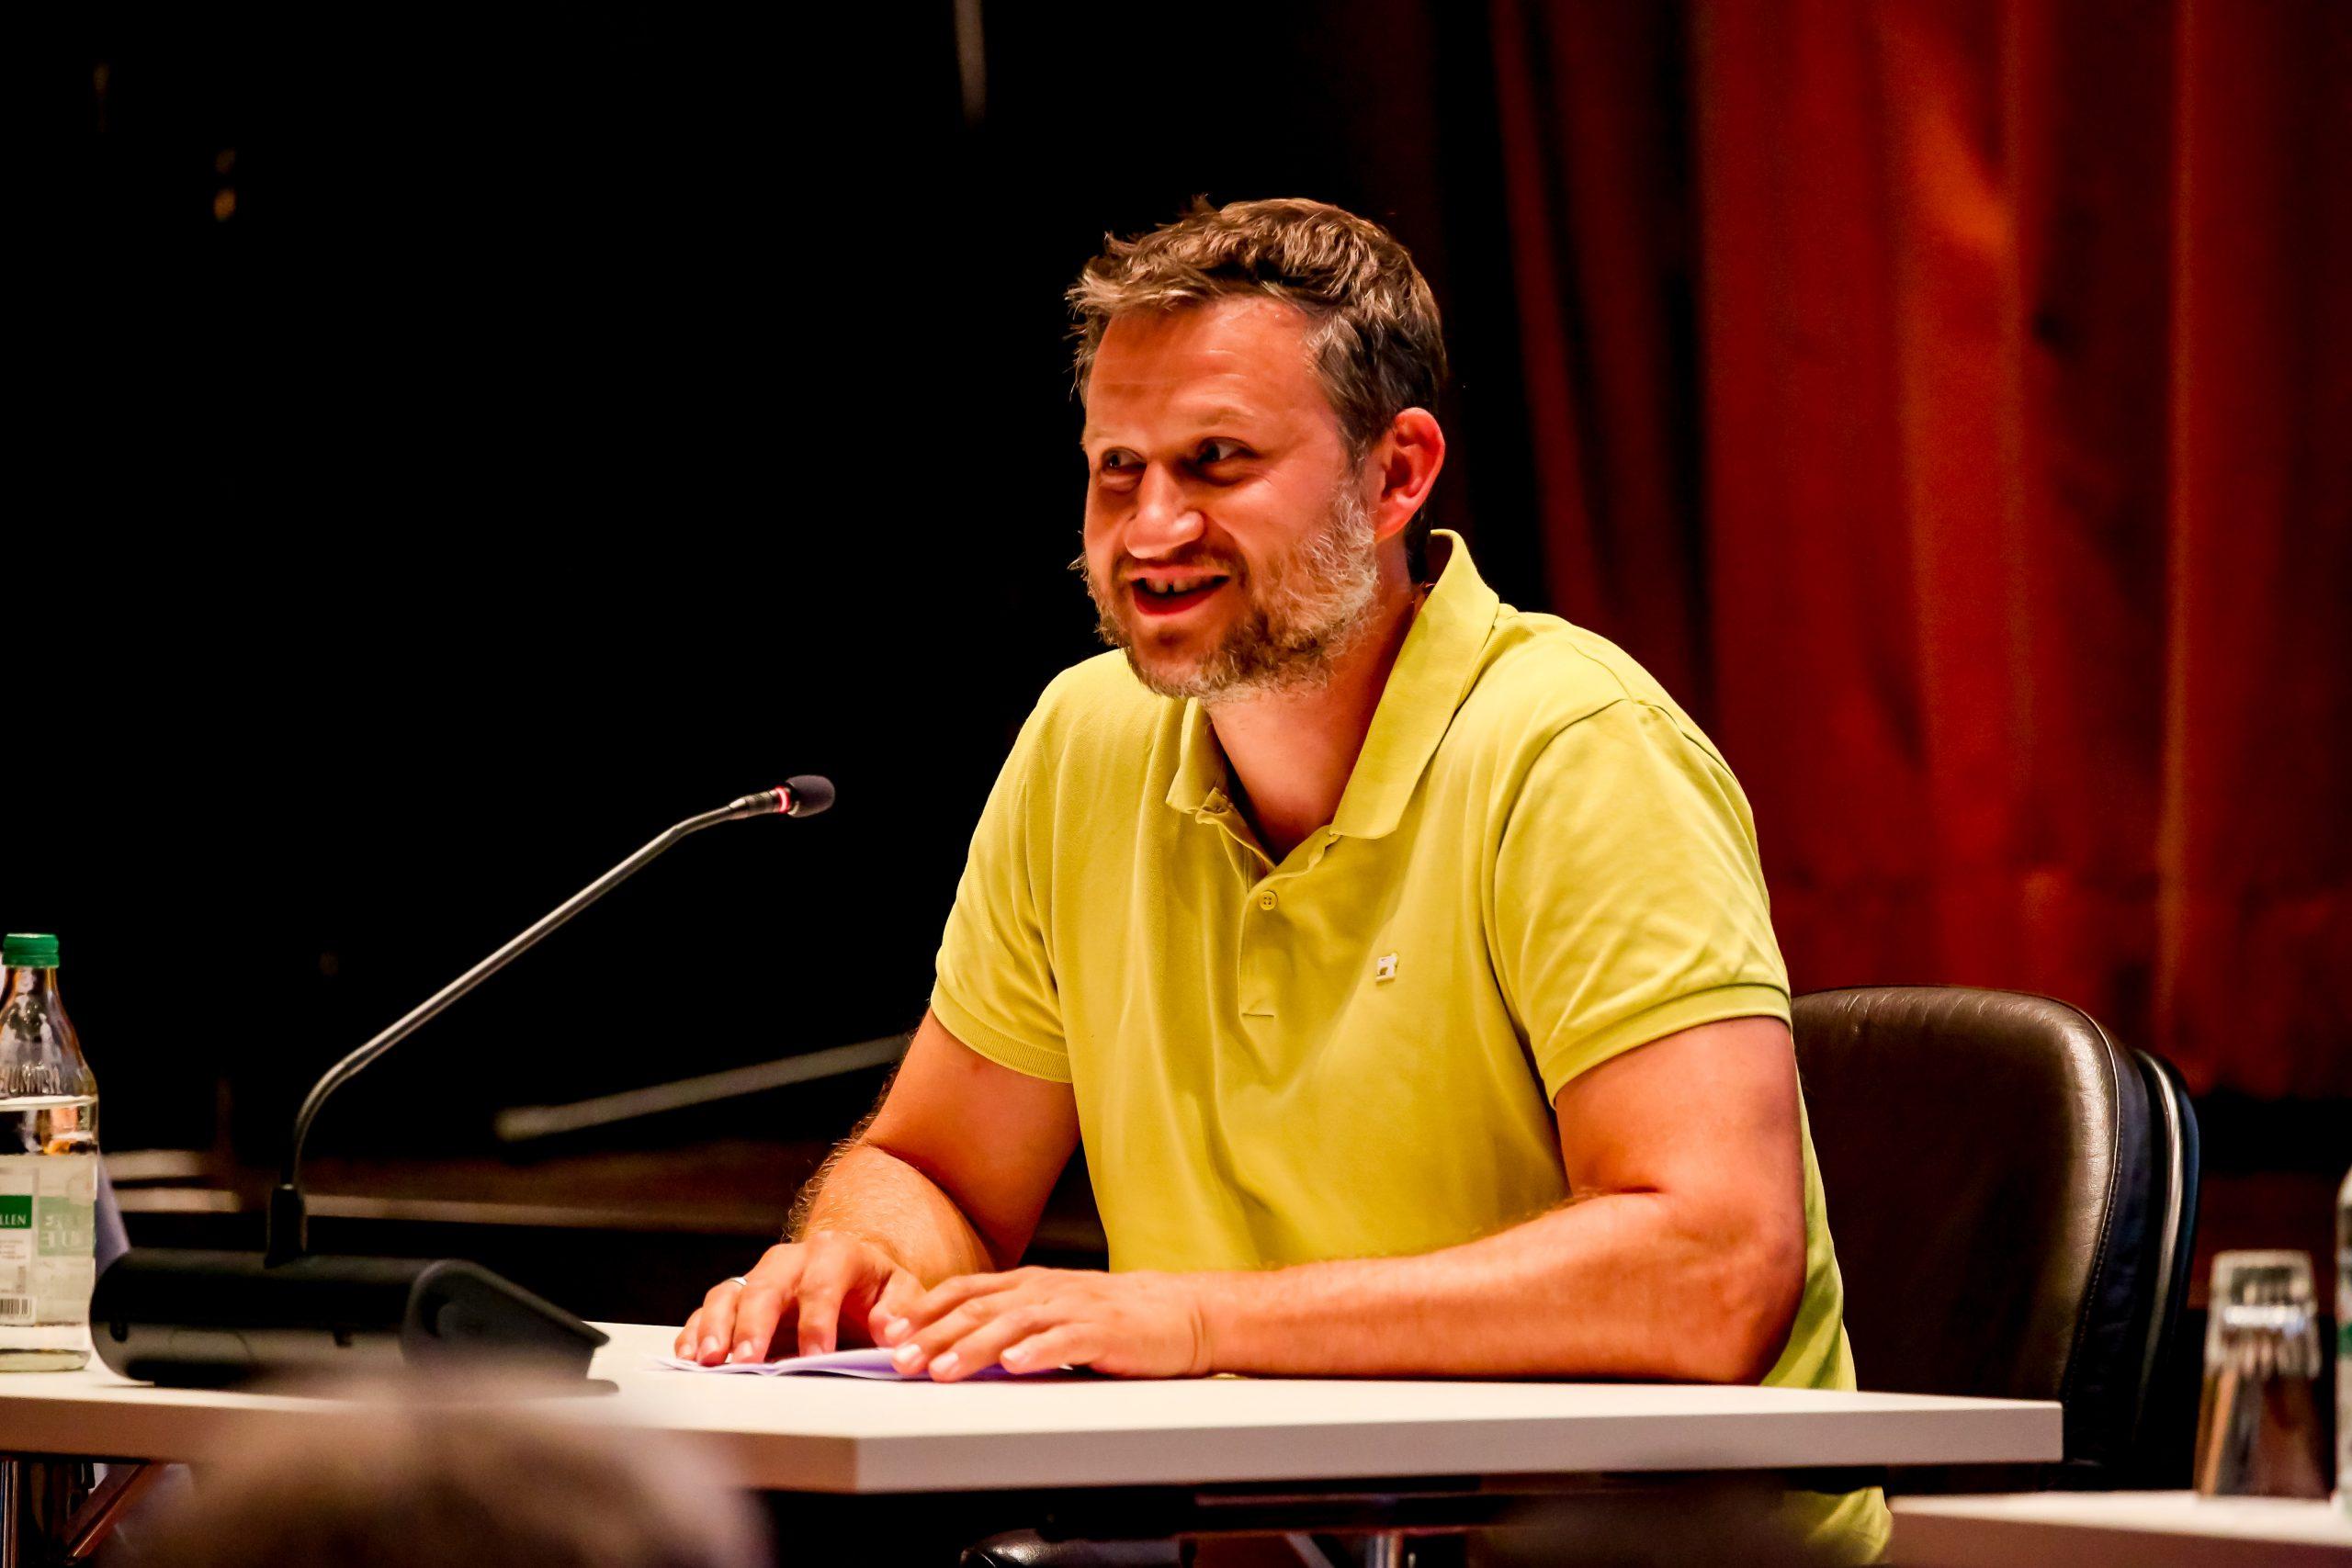 HBW Geschäftsführer und erster Gartenschaubotschafter Wolfgang Strobel